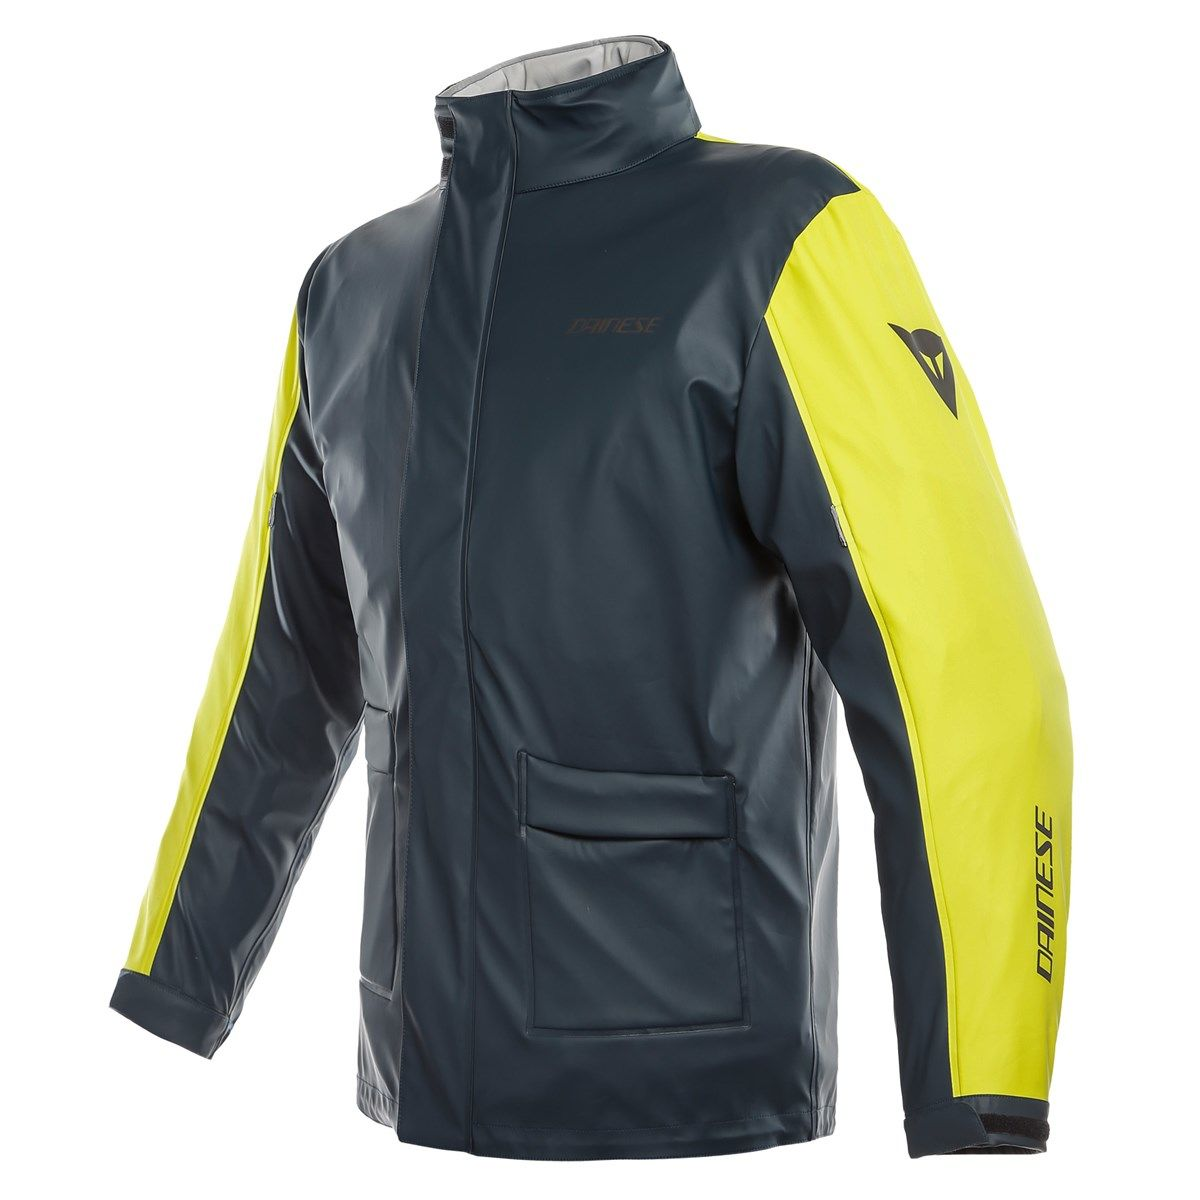 Dainese Storm Jacket Antrax Fluo Yellow Üst Yağmurluk